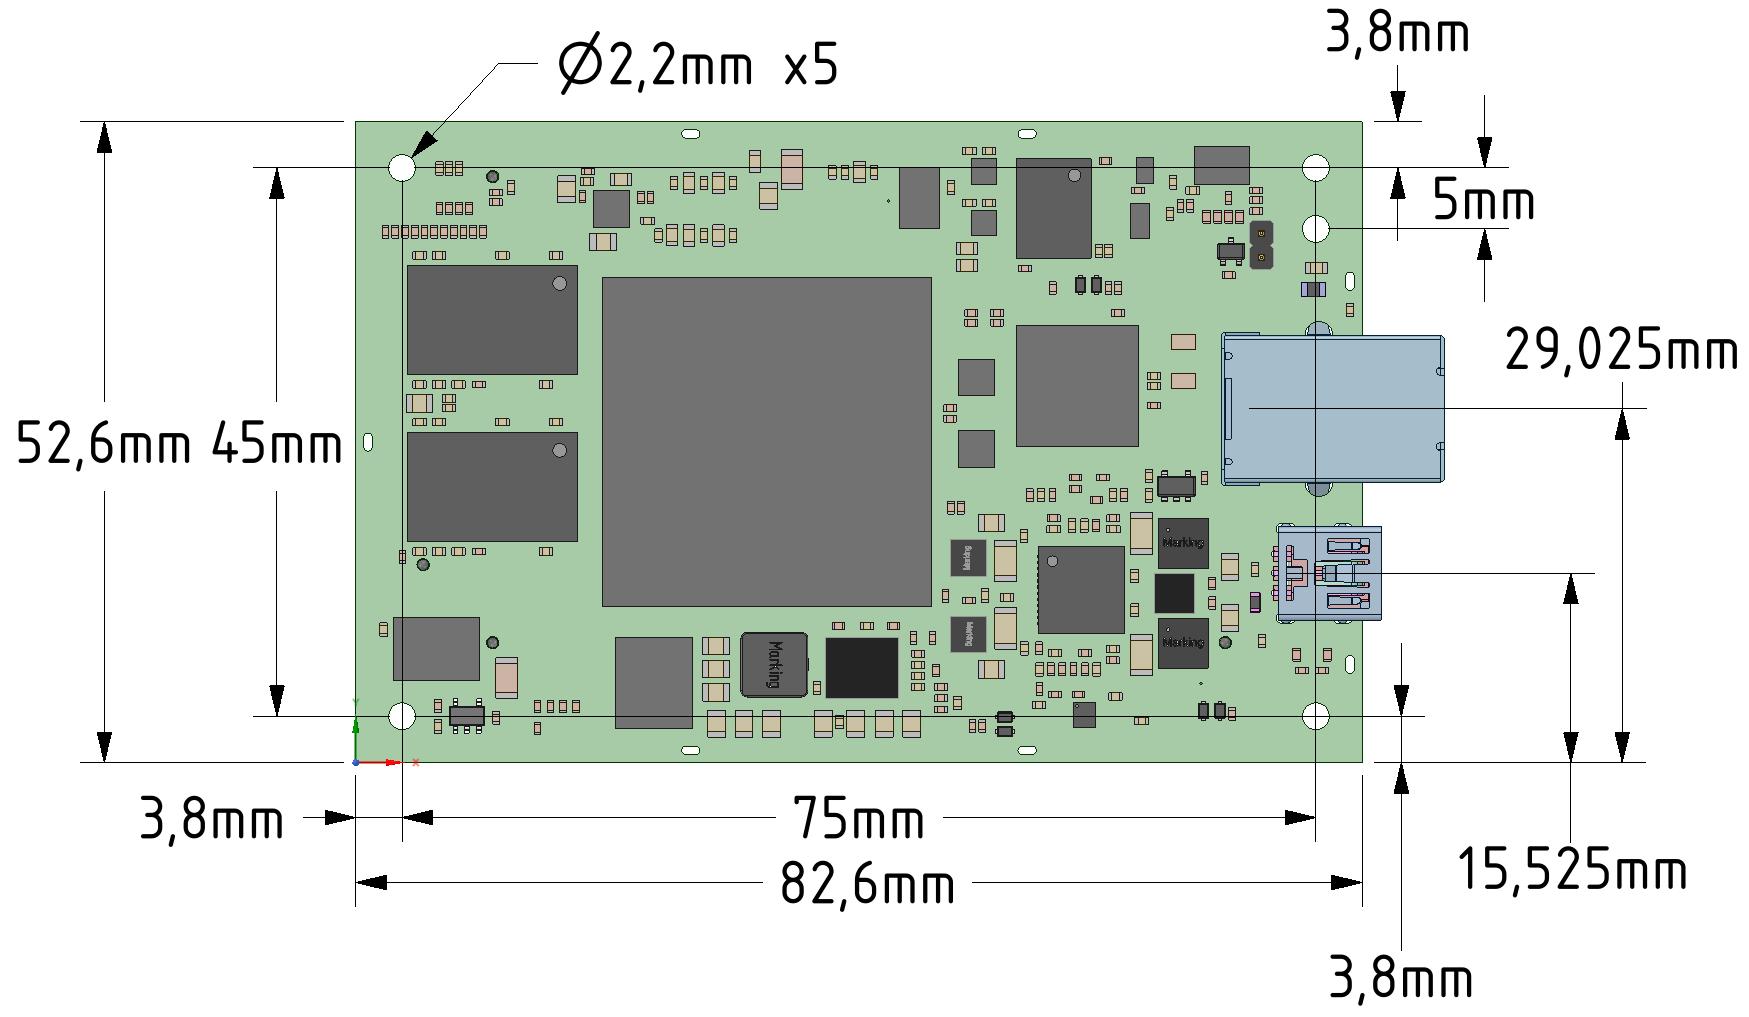 FPGA - CESYS Gesellschaft für angewandte Mikroelektronik